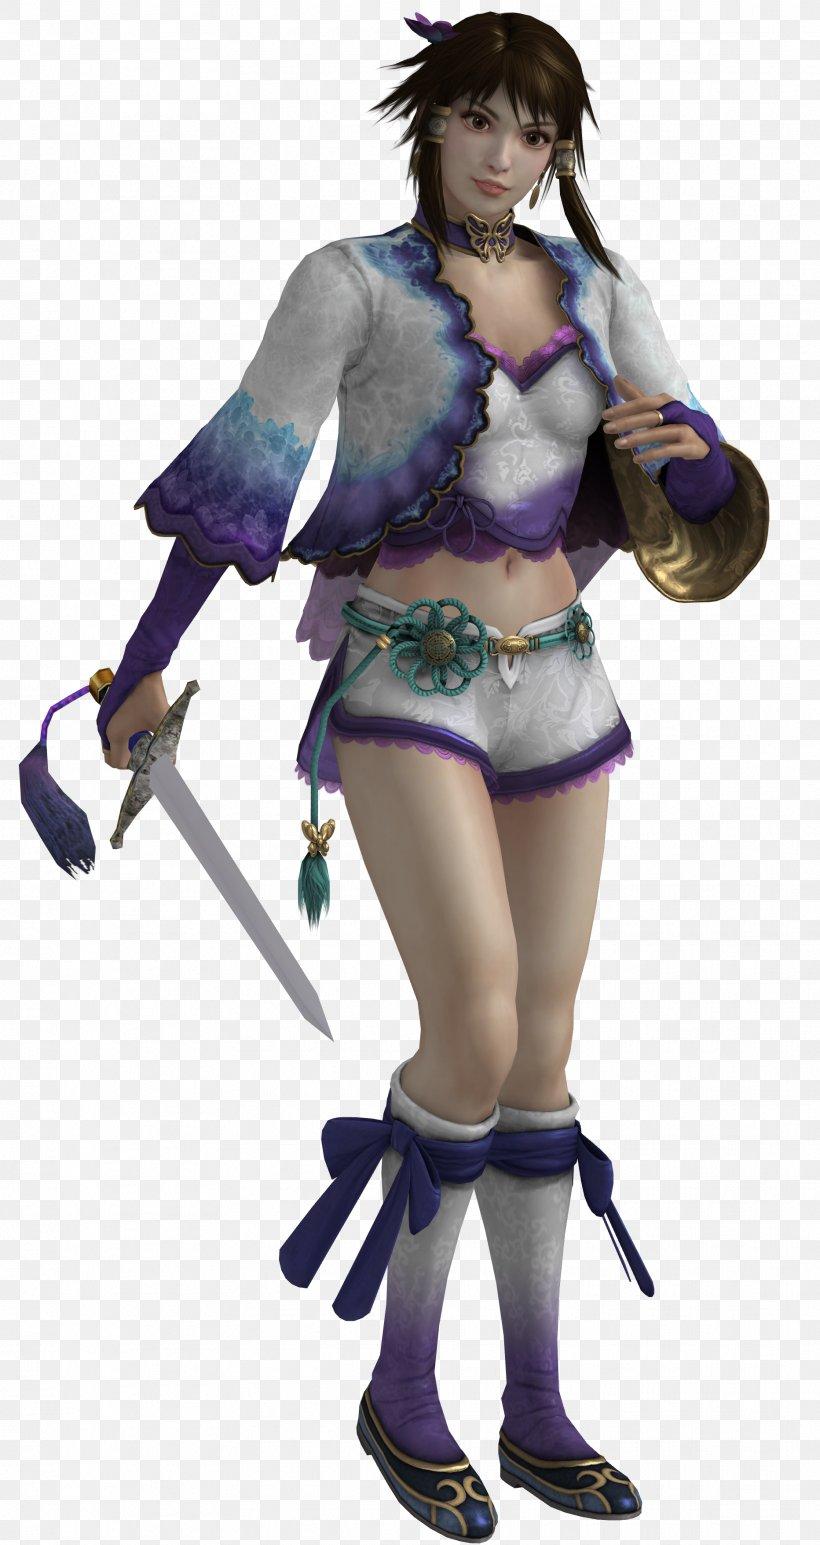 friends-chai-xianghua-soul-cosplay-costume-design-png-favpng-X1jsPvmQF3Eef25CQrcLnkVSL.jpg